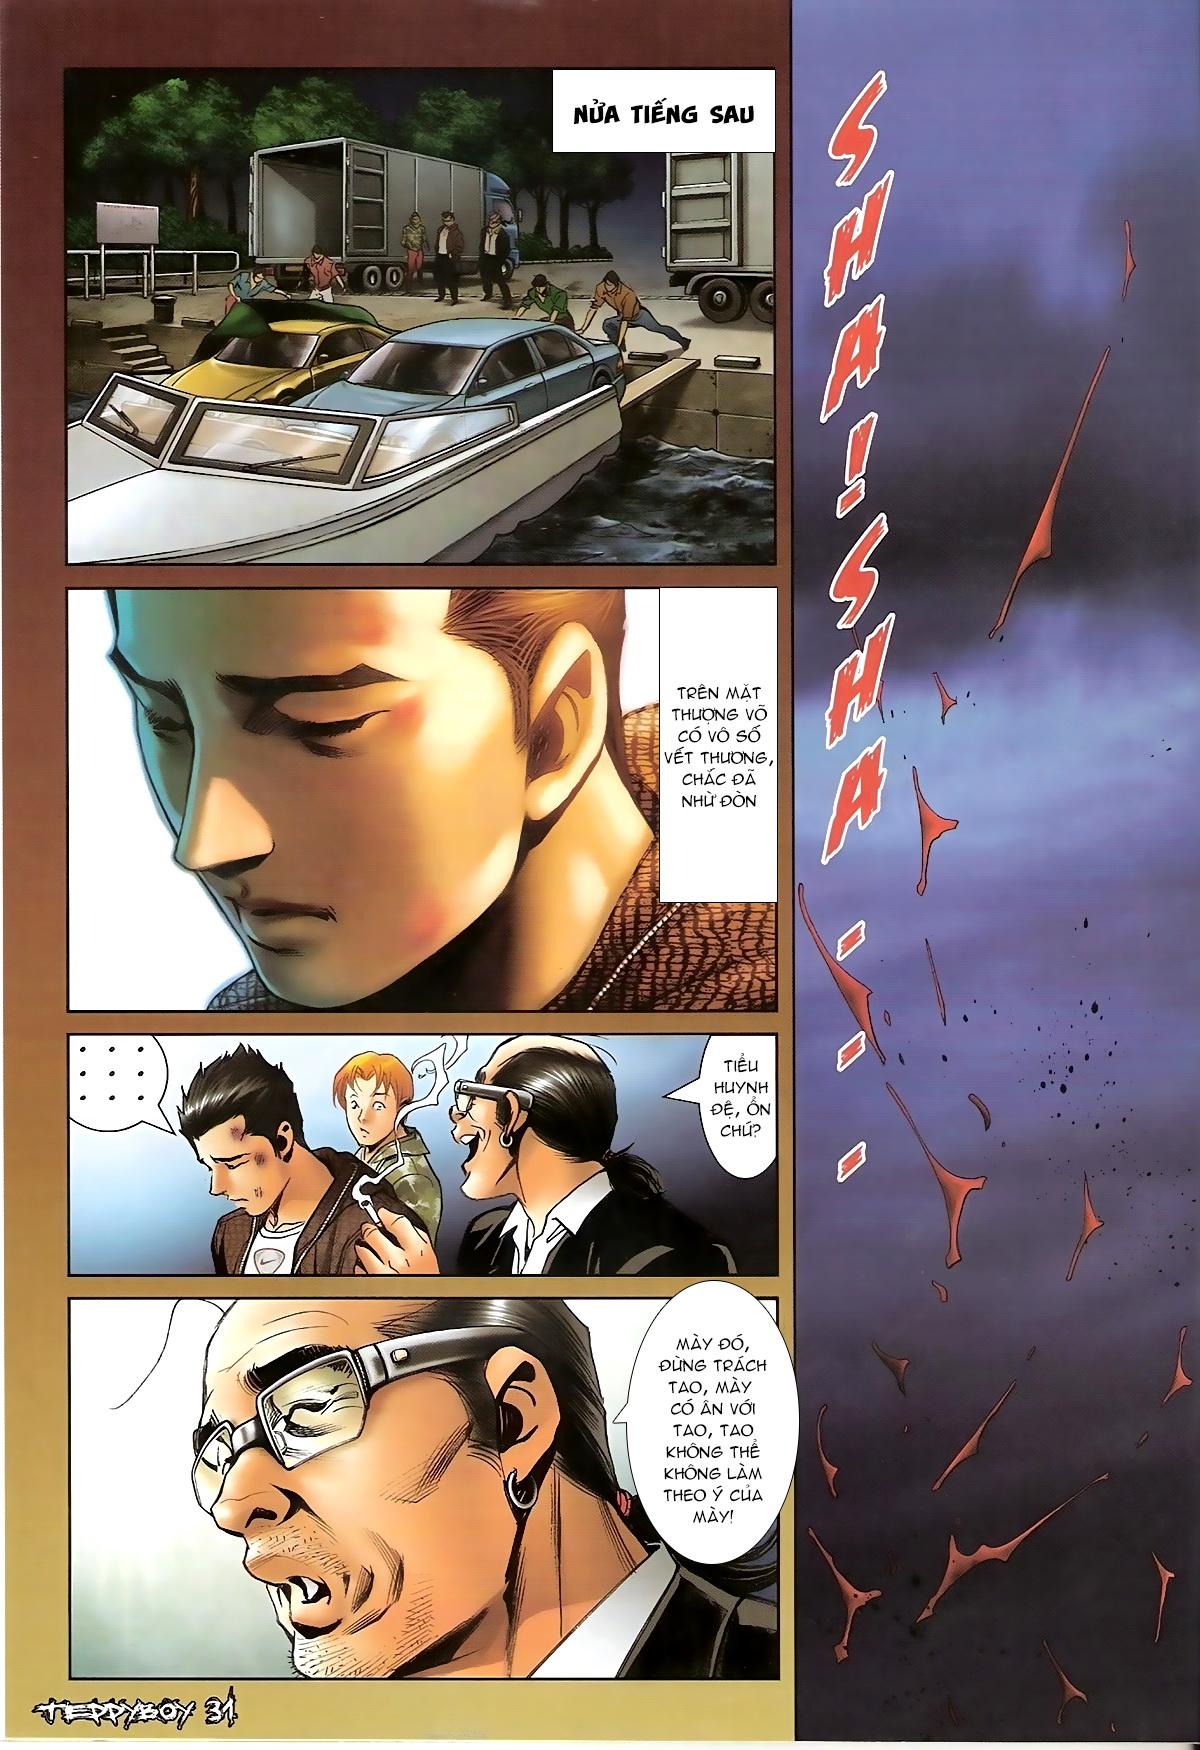 Người Trong Giang Hồ - Chapter 1317: Tao phải thắng lão - Pic 27